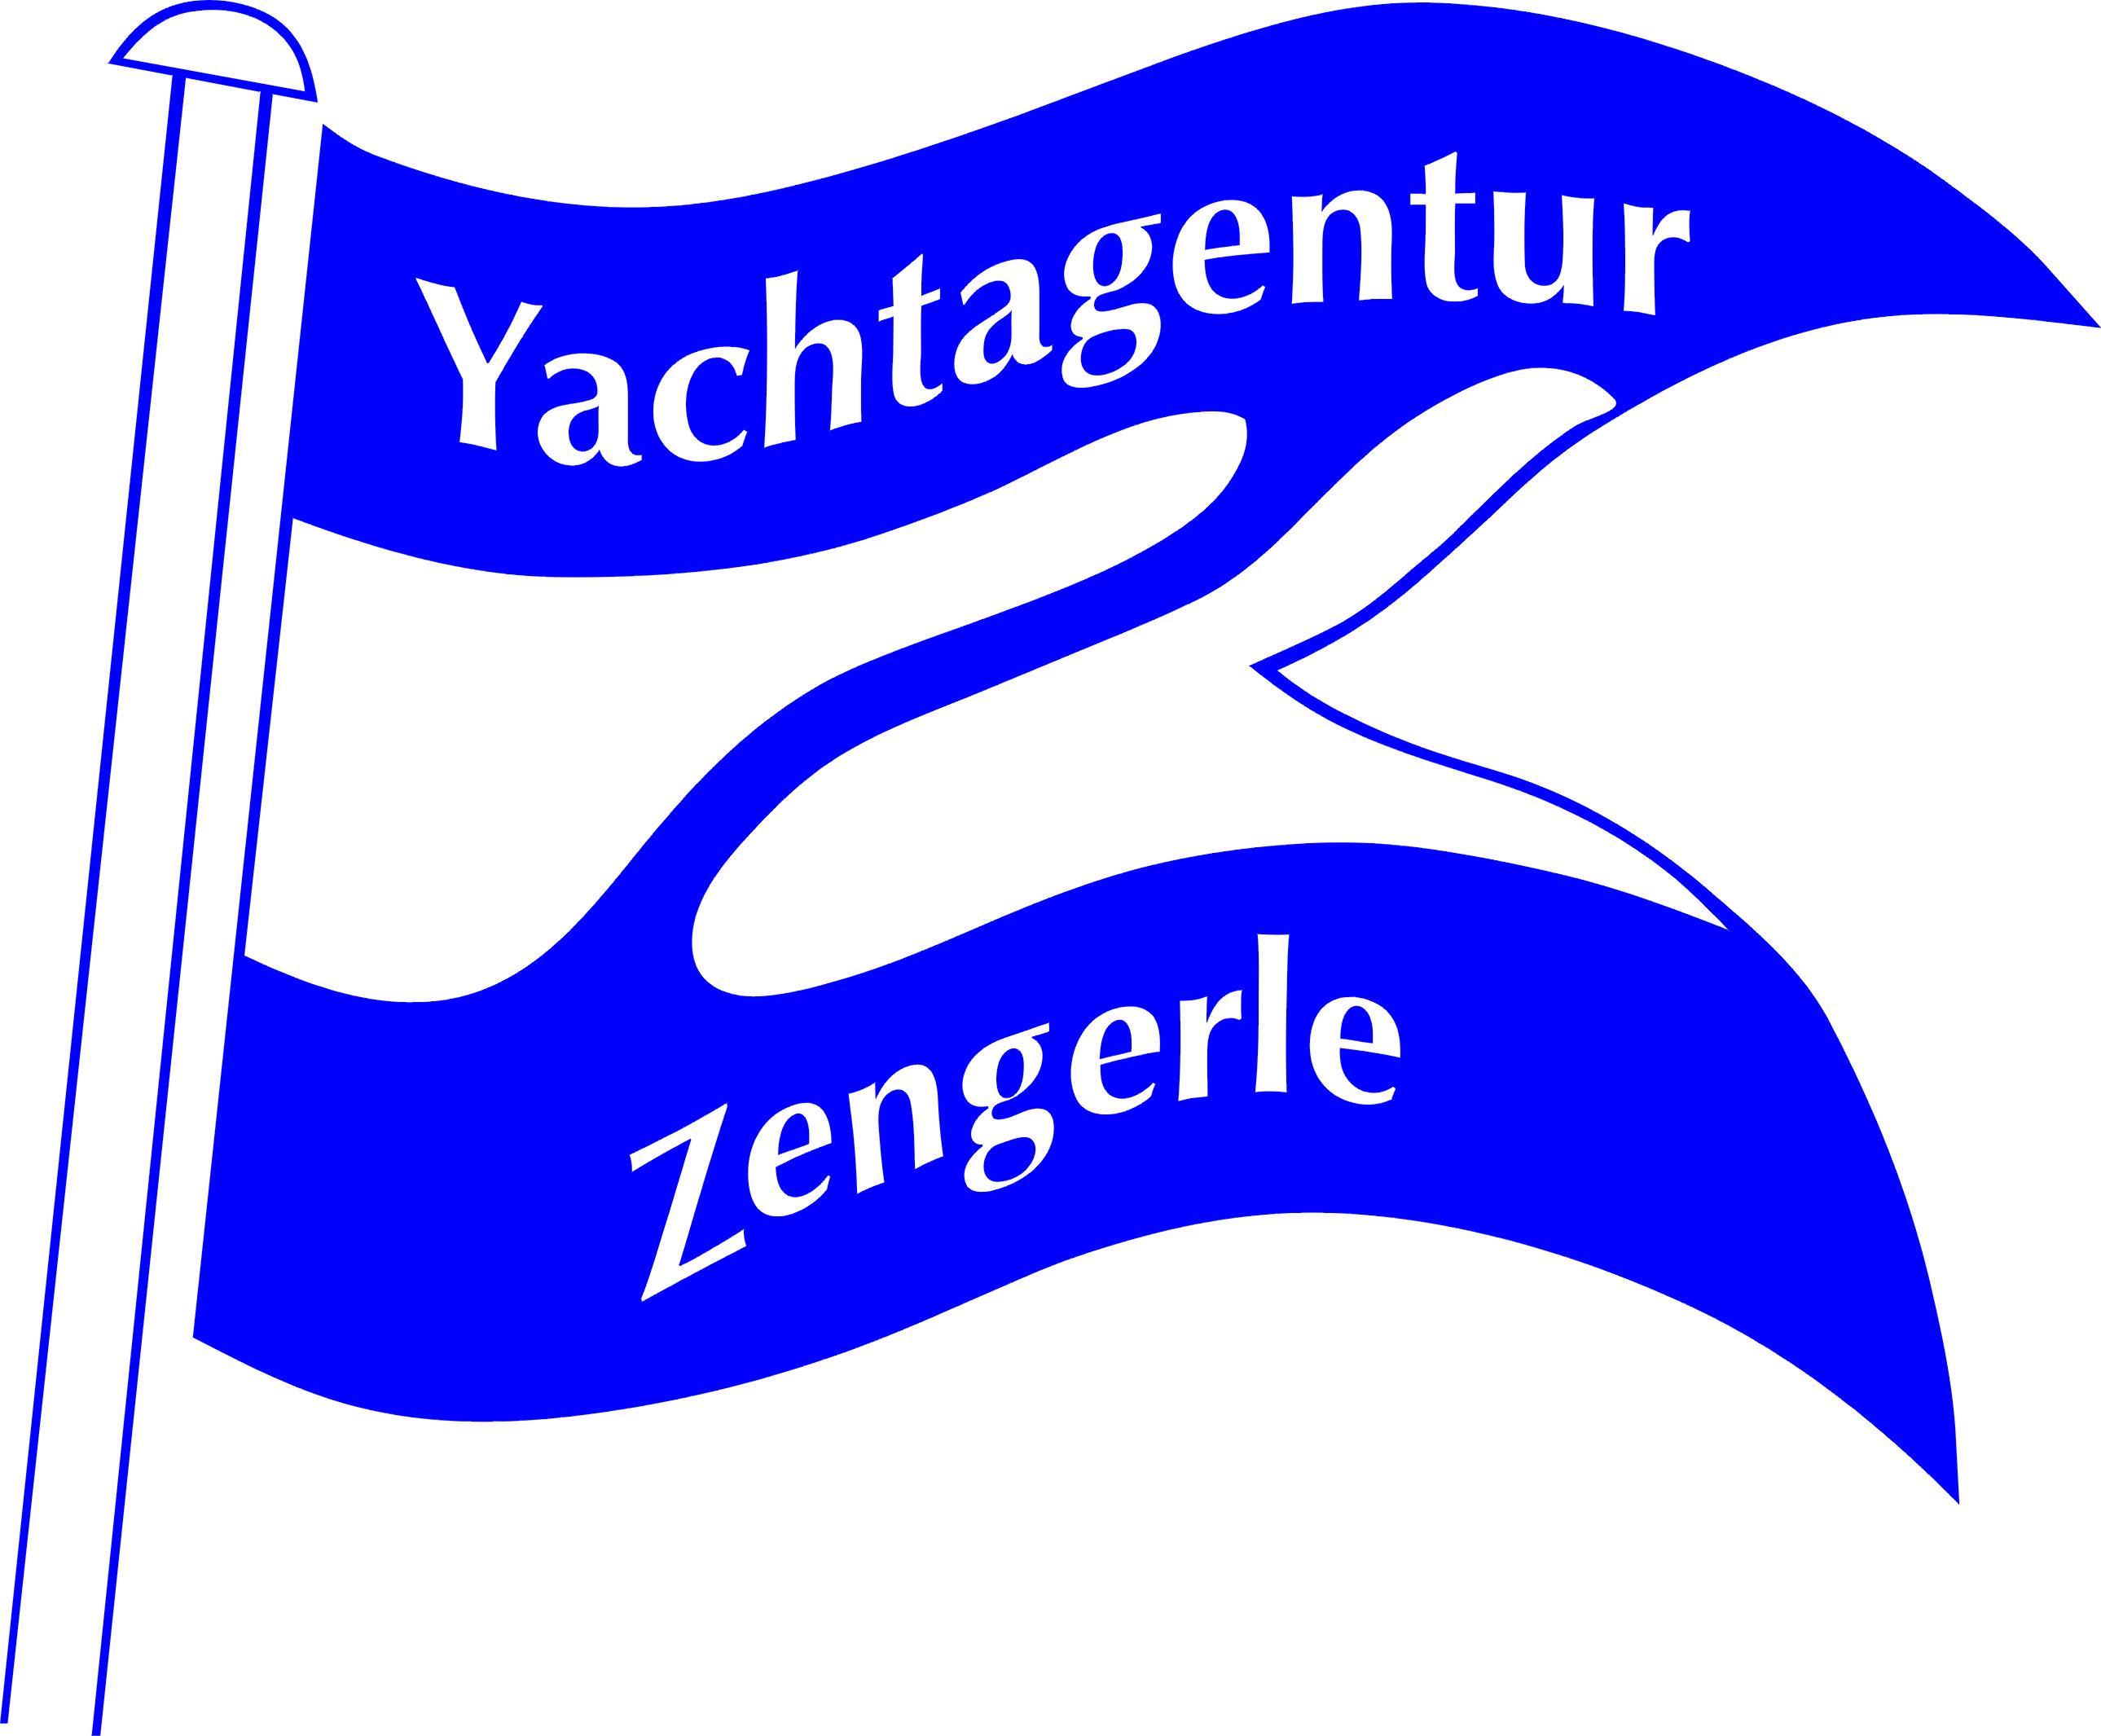 Yachtagentur-Zengerle